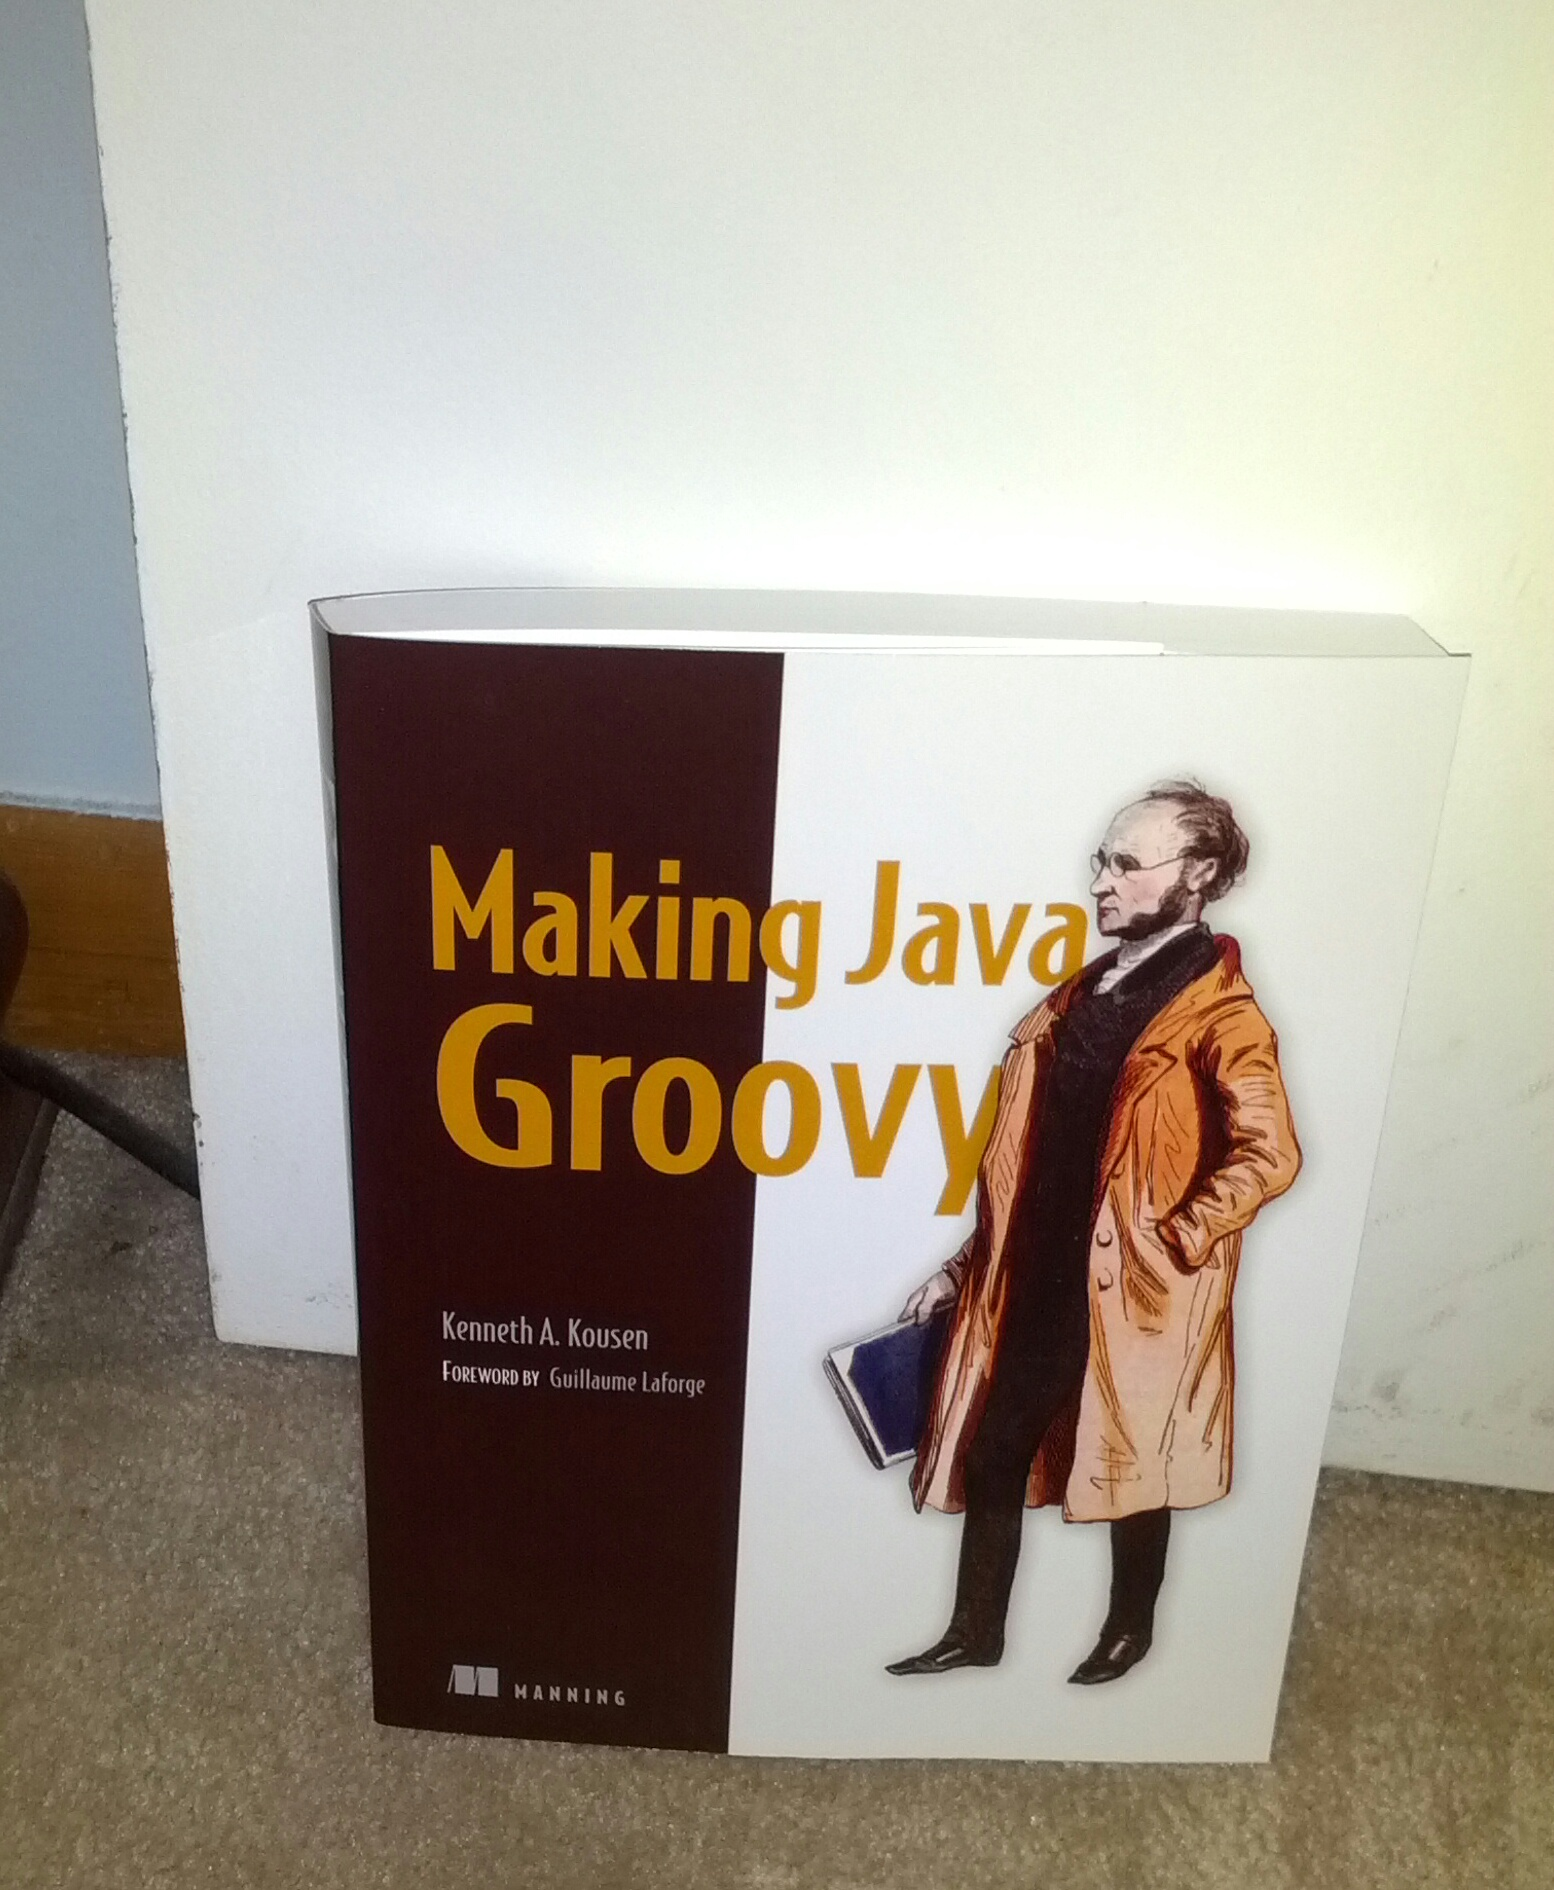 Making Java Groovy | Stuff I've learned recently